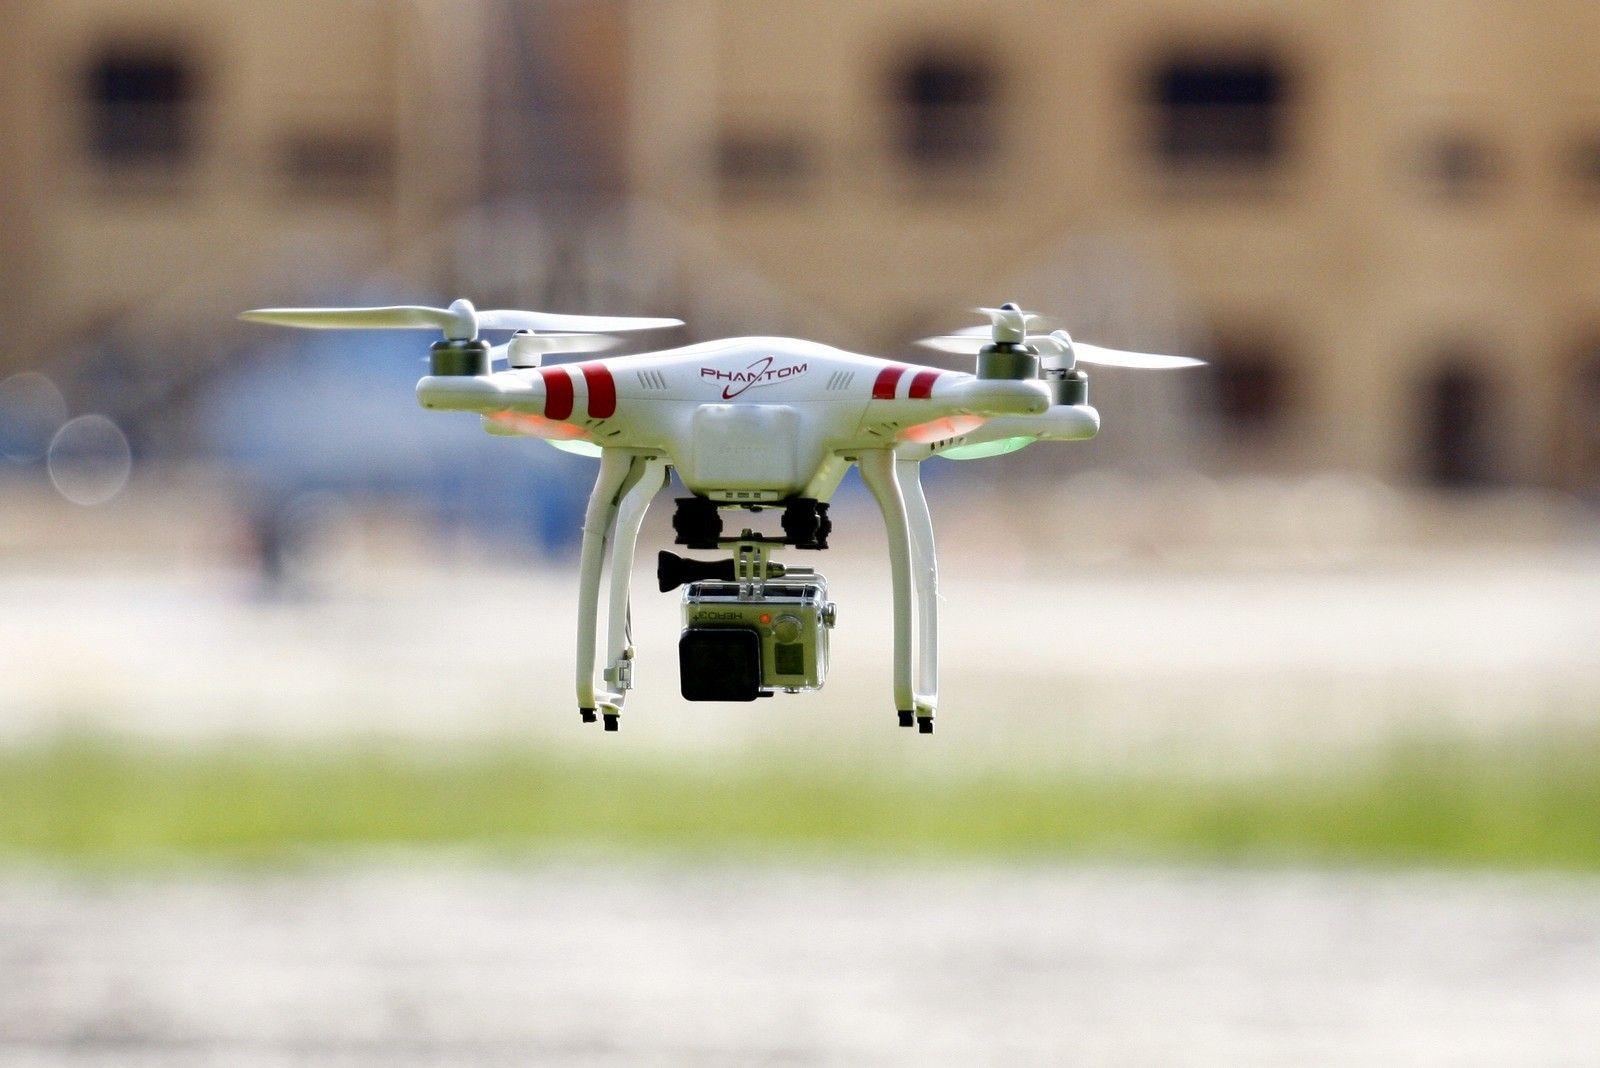 Anyone fly drones? - DJI Pics 5-20-14 027.JPG